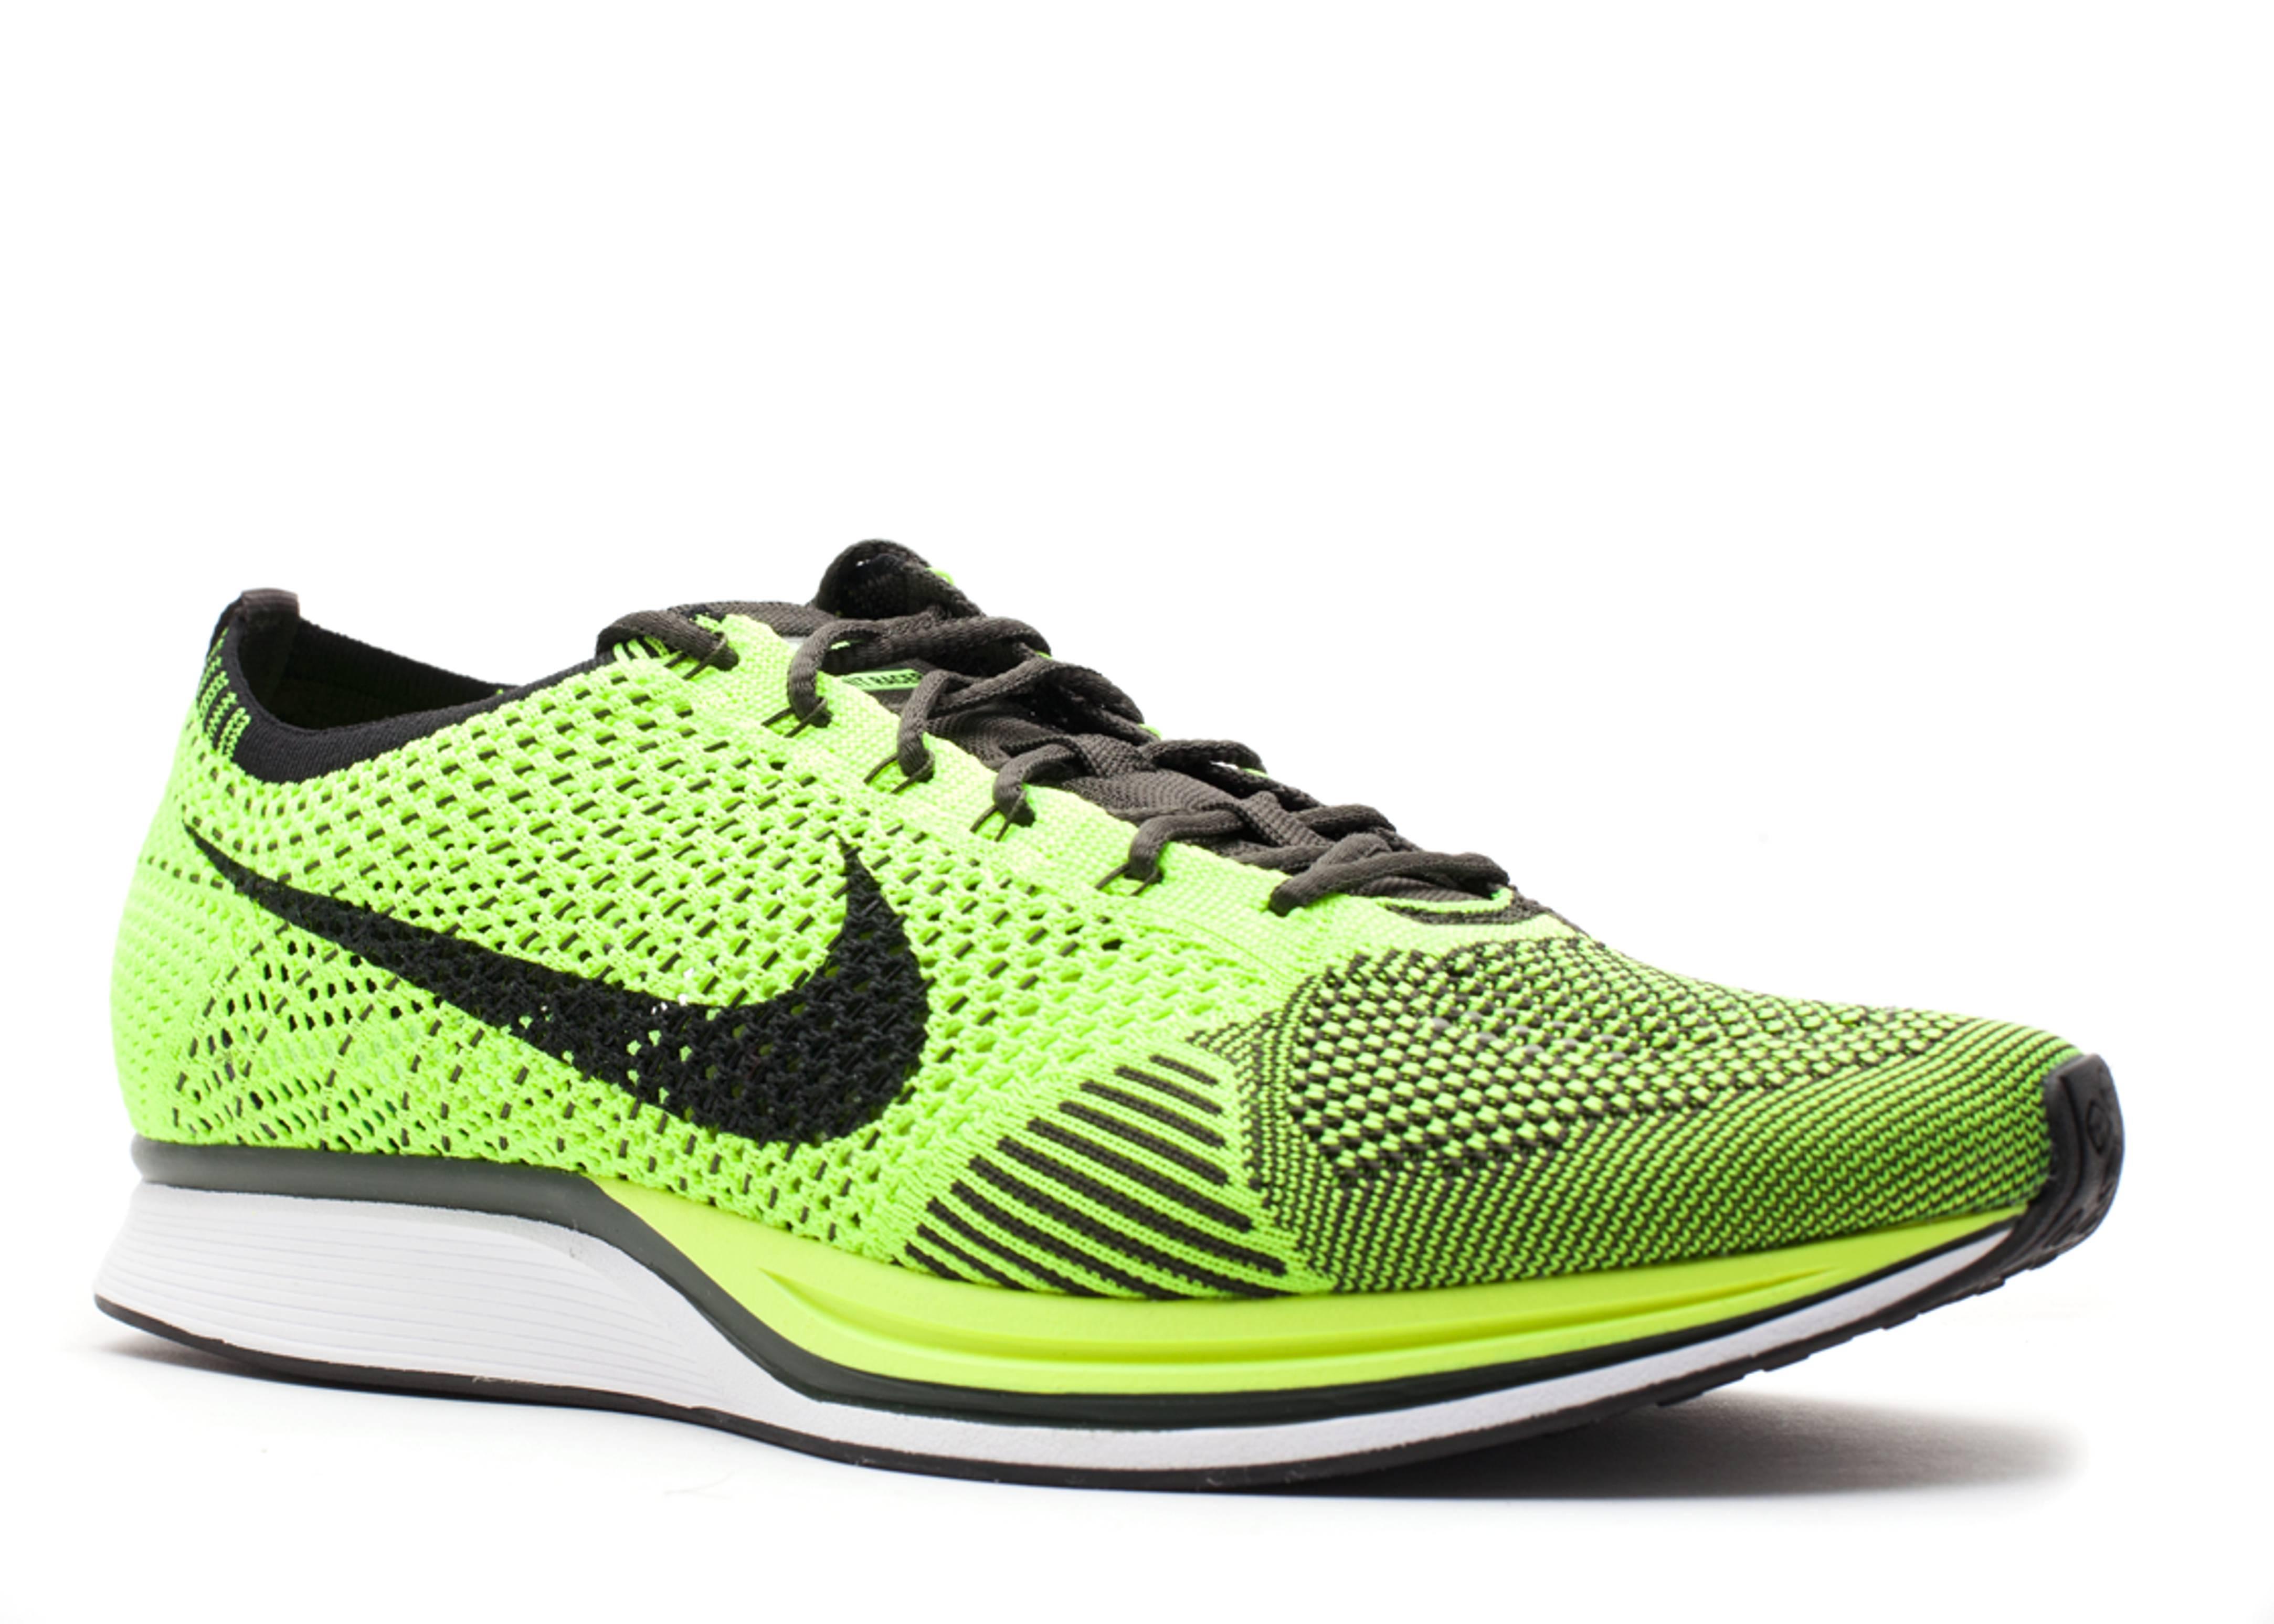 Flyknit Racer - Nike - 526628 721 - voltblack-sequoia Fligh ... fc309f3d4